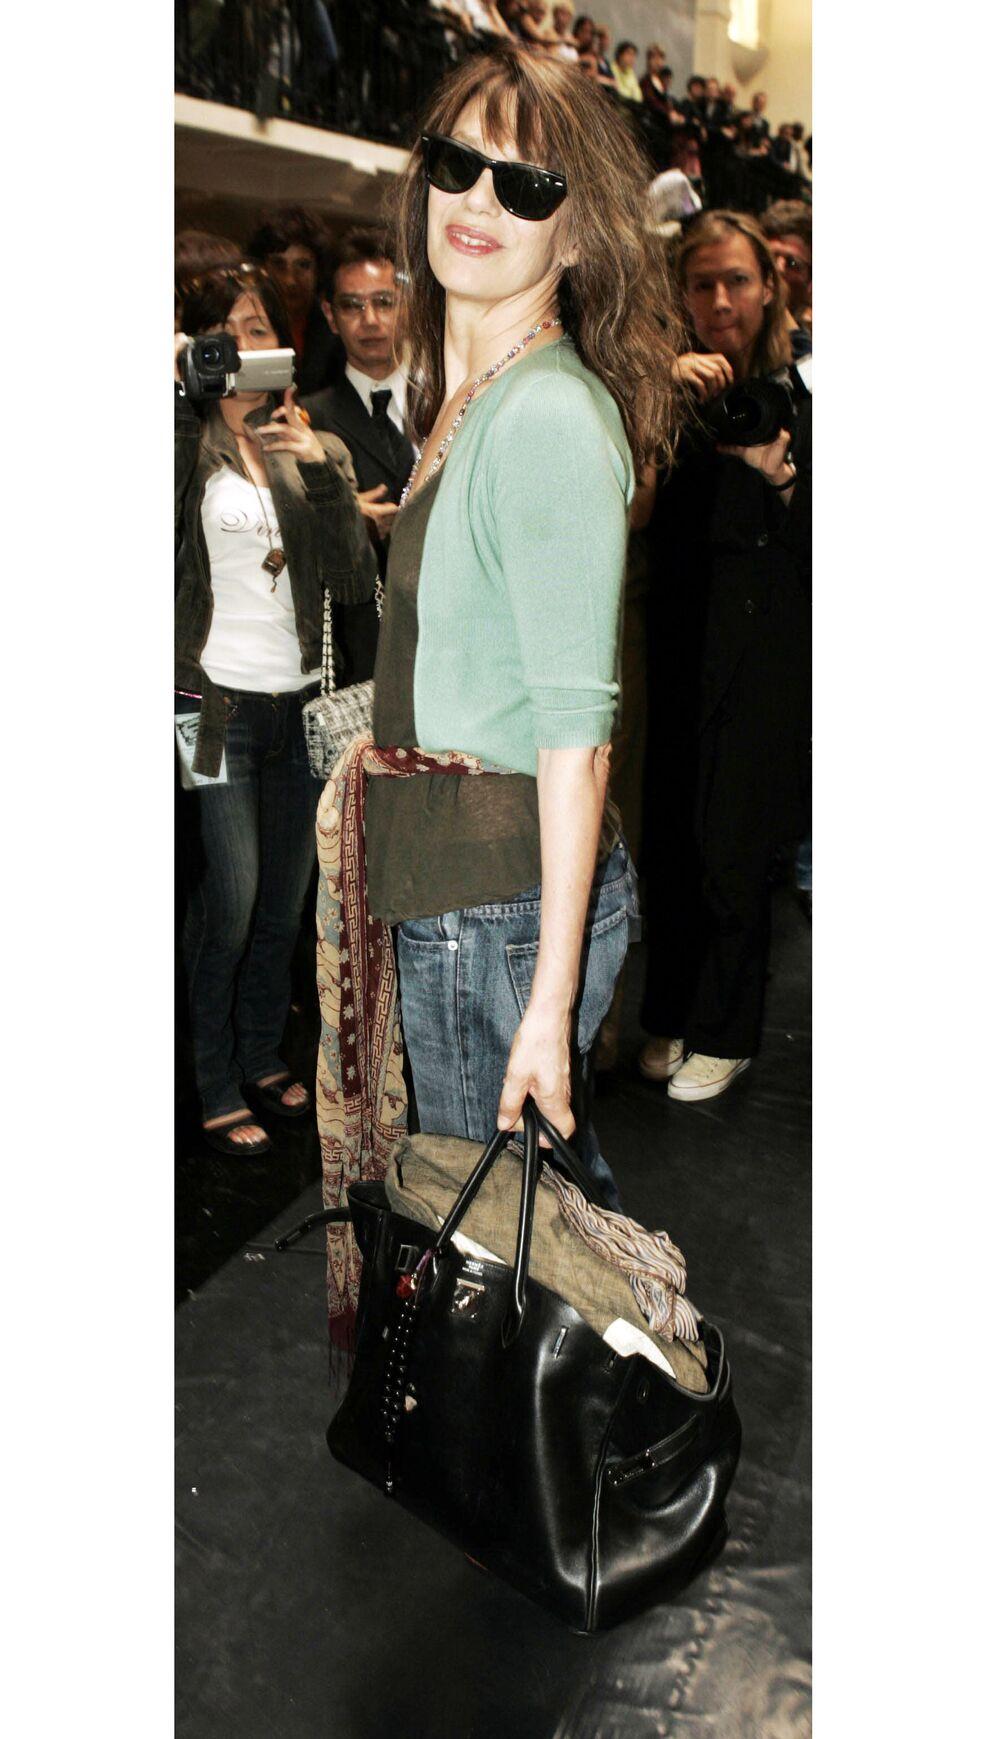 How the Legendary Birkin Bag Remains Dominant - Bloomberg 9e7e08a3719f6